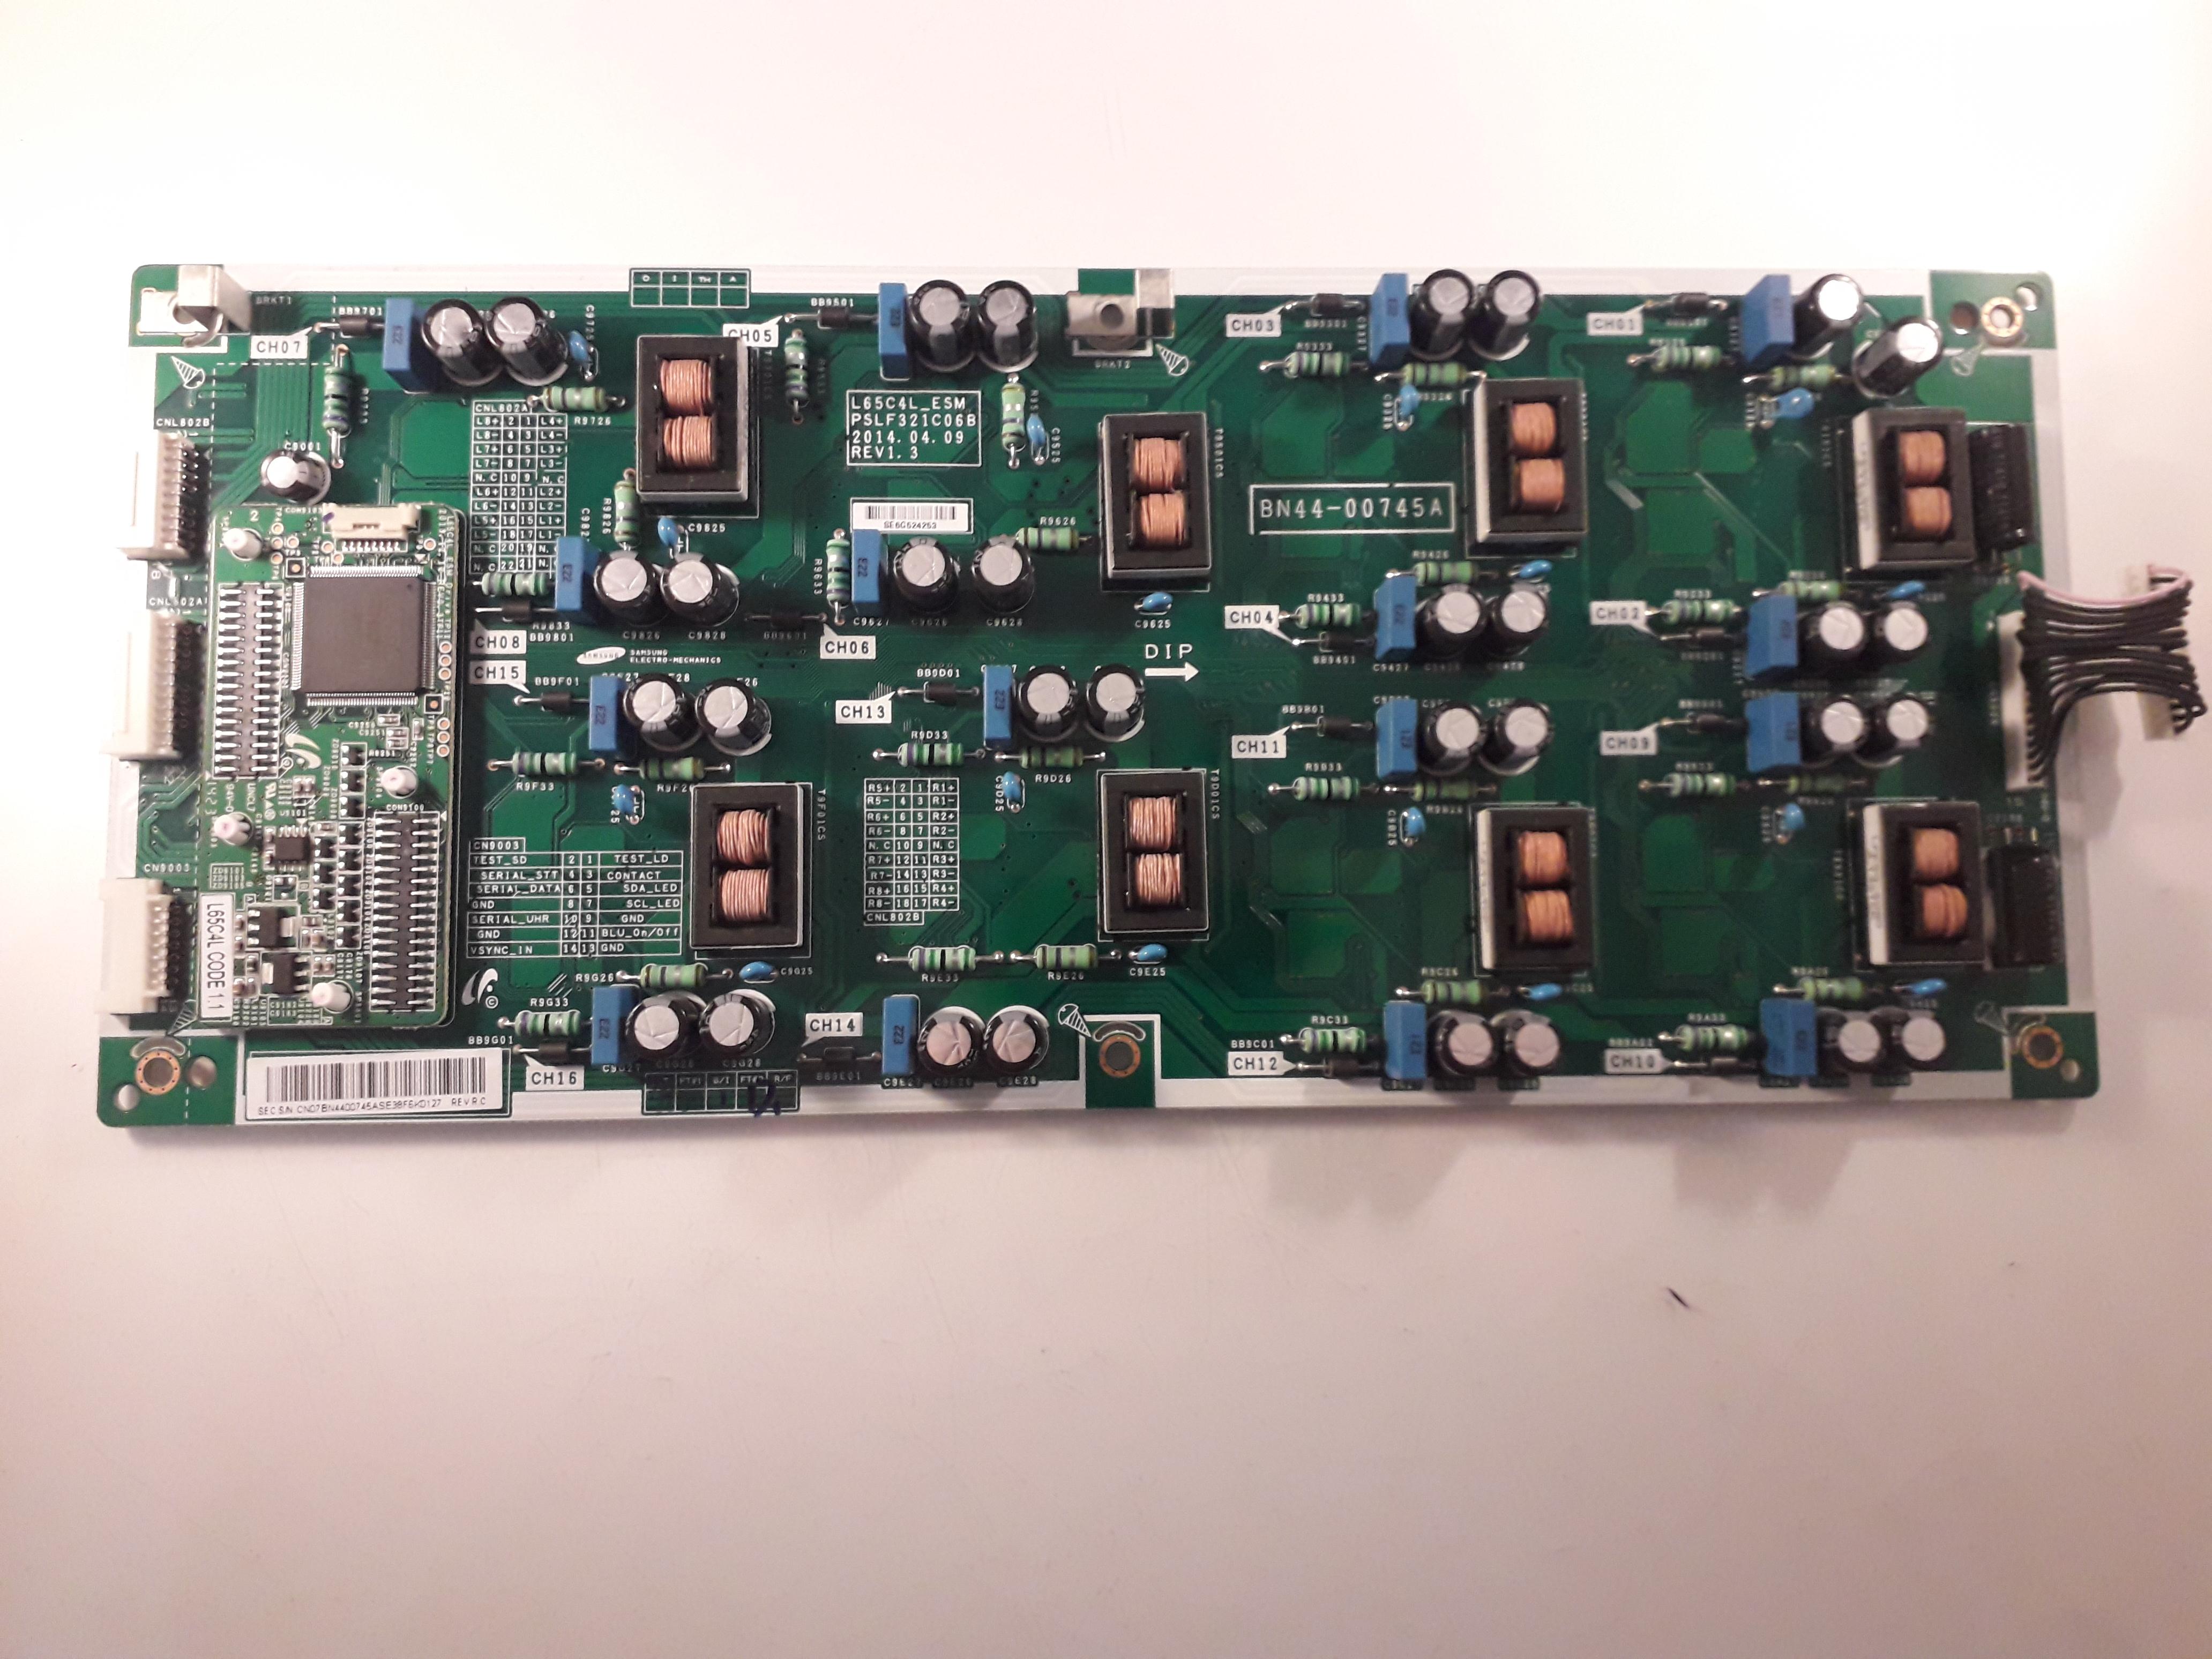 Calvas NEW ORIGINAL SMART HUB AUDIO SOUND TOUCH VOICE REMOTE CONTROL FOR UE55HU8500TXXU UE55HU8500ZXZT UE55HU8505QXXE UE55HU8590VXZG